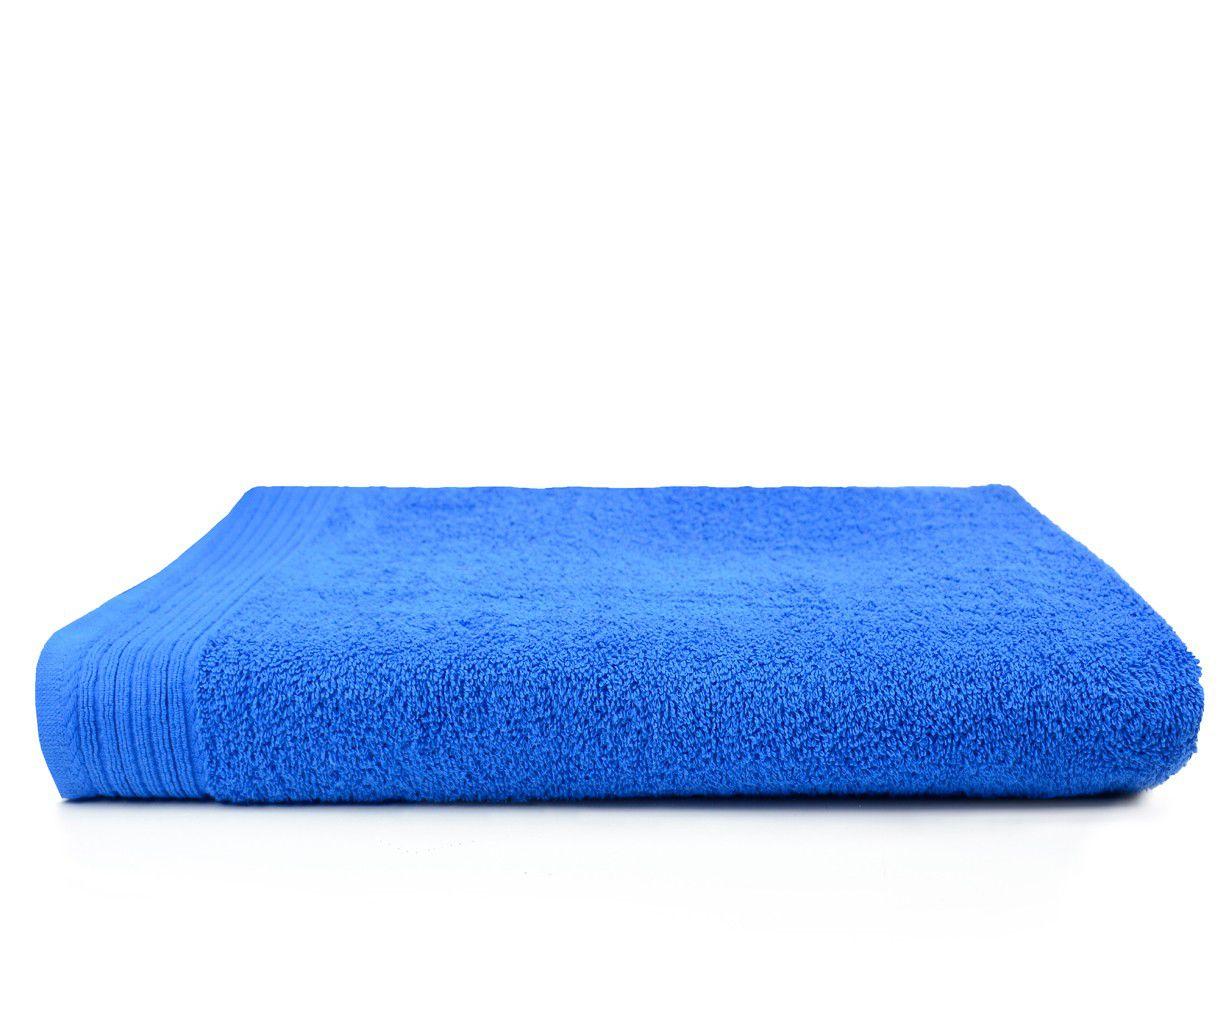 The One Badlaken 450 gram 100x180 cm Royal Blue